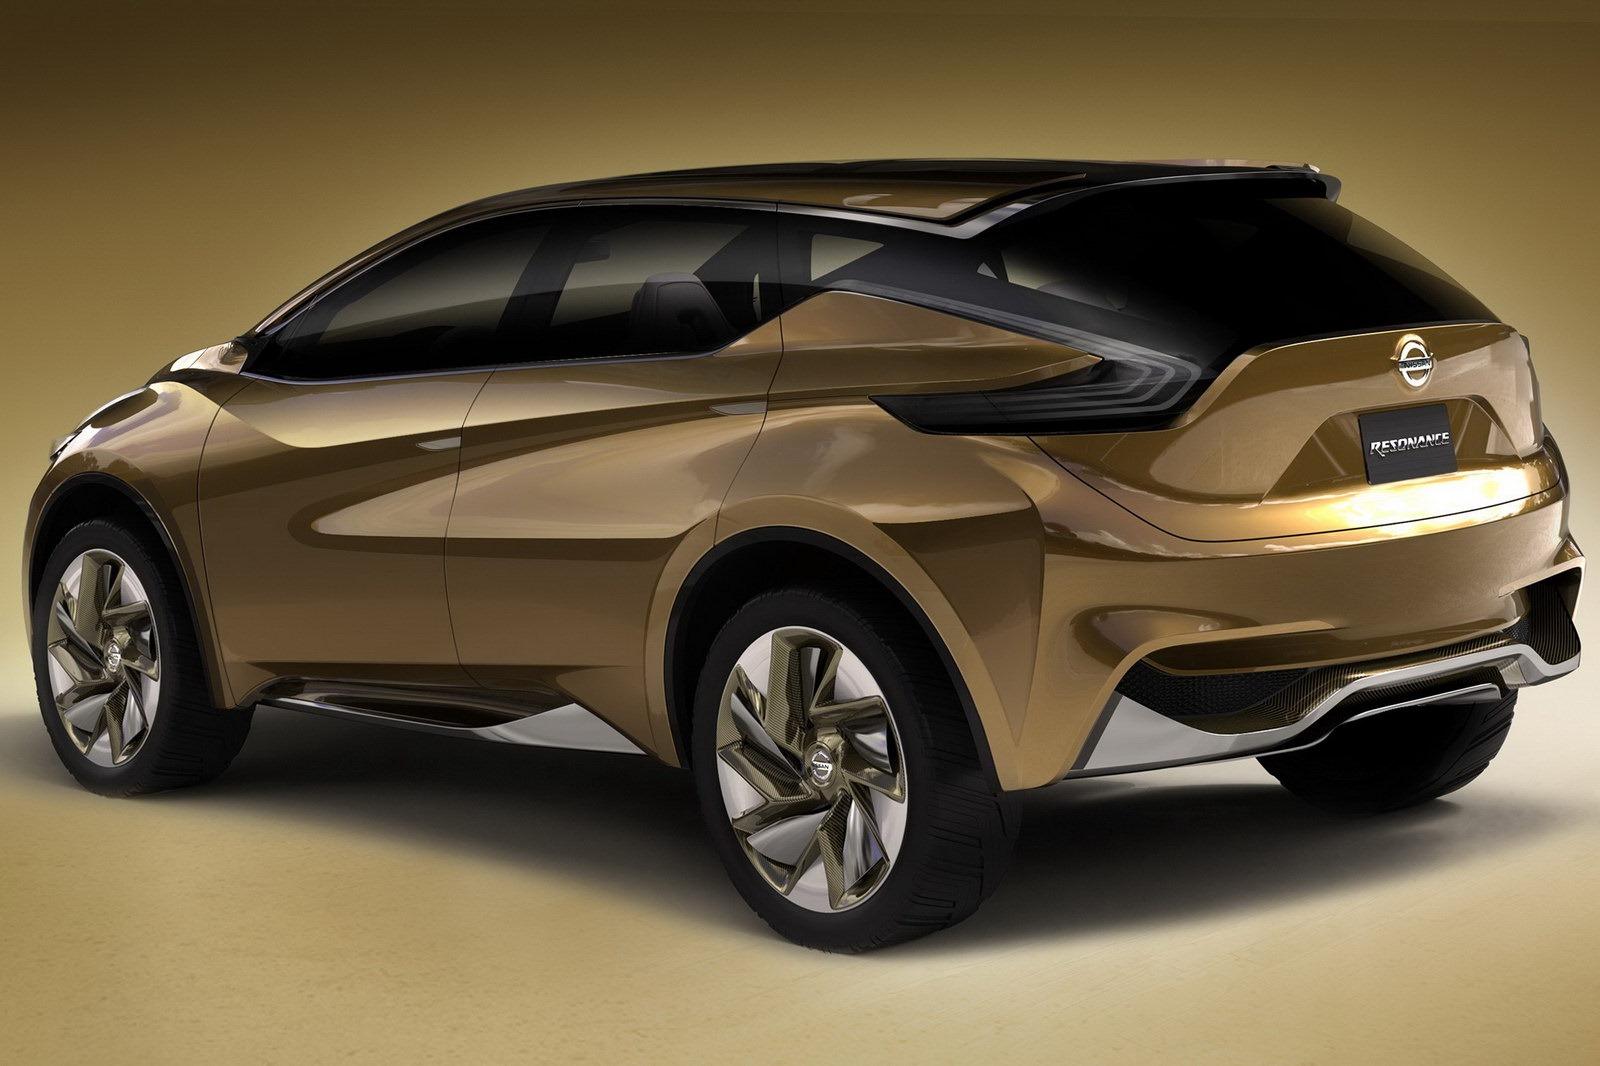 2015 Nissan Murano Concept Release Date